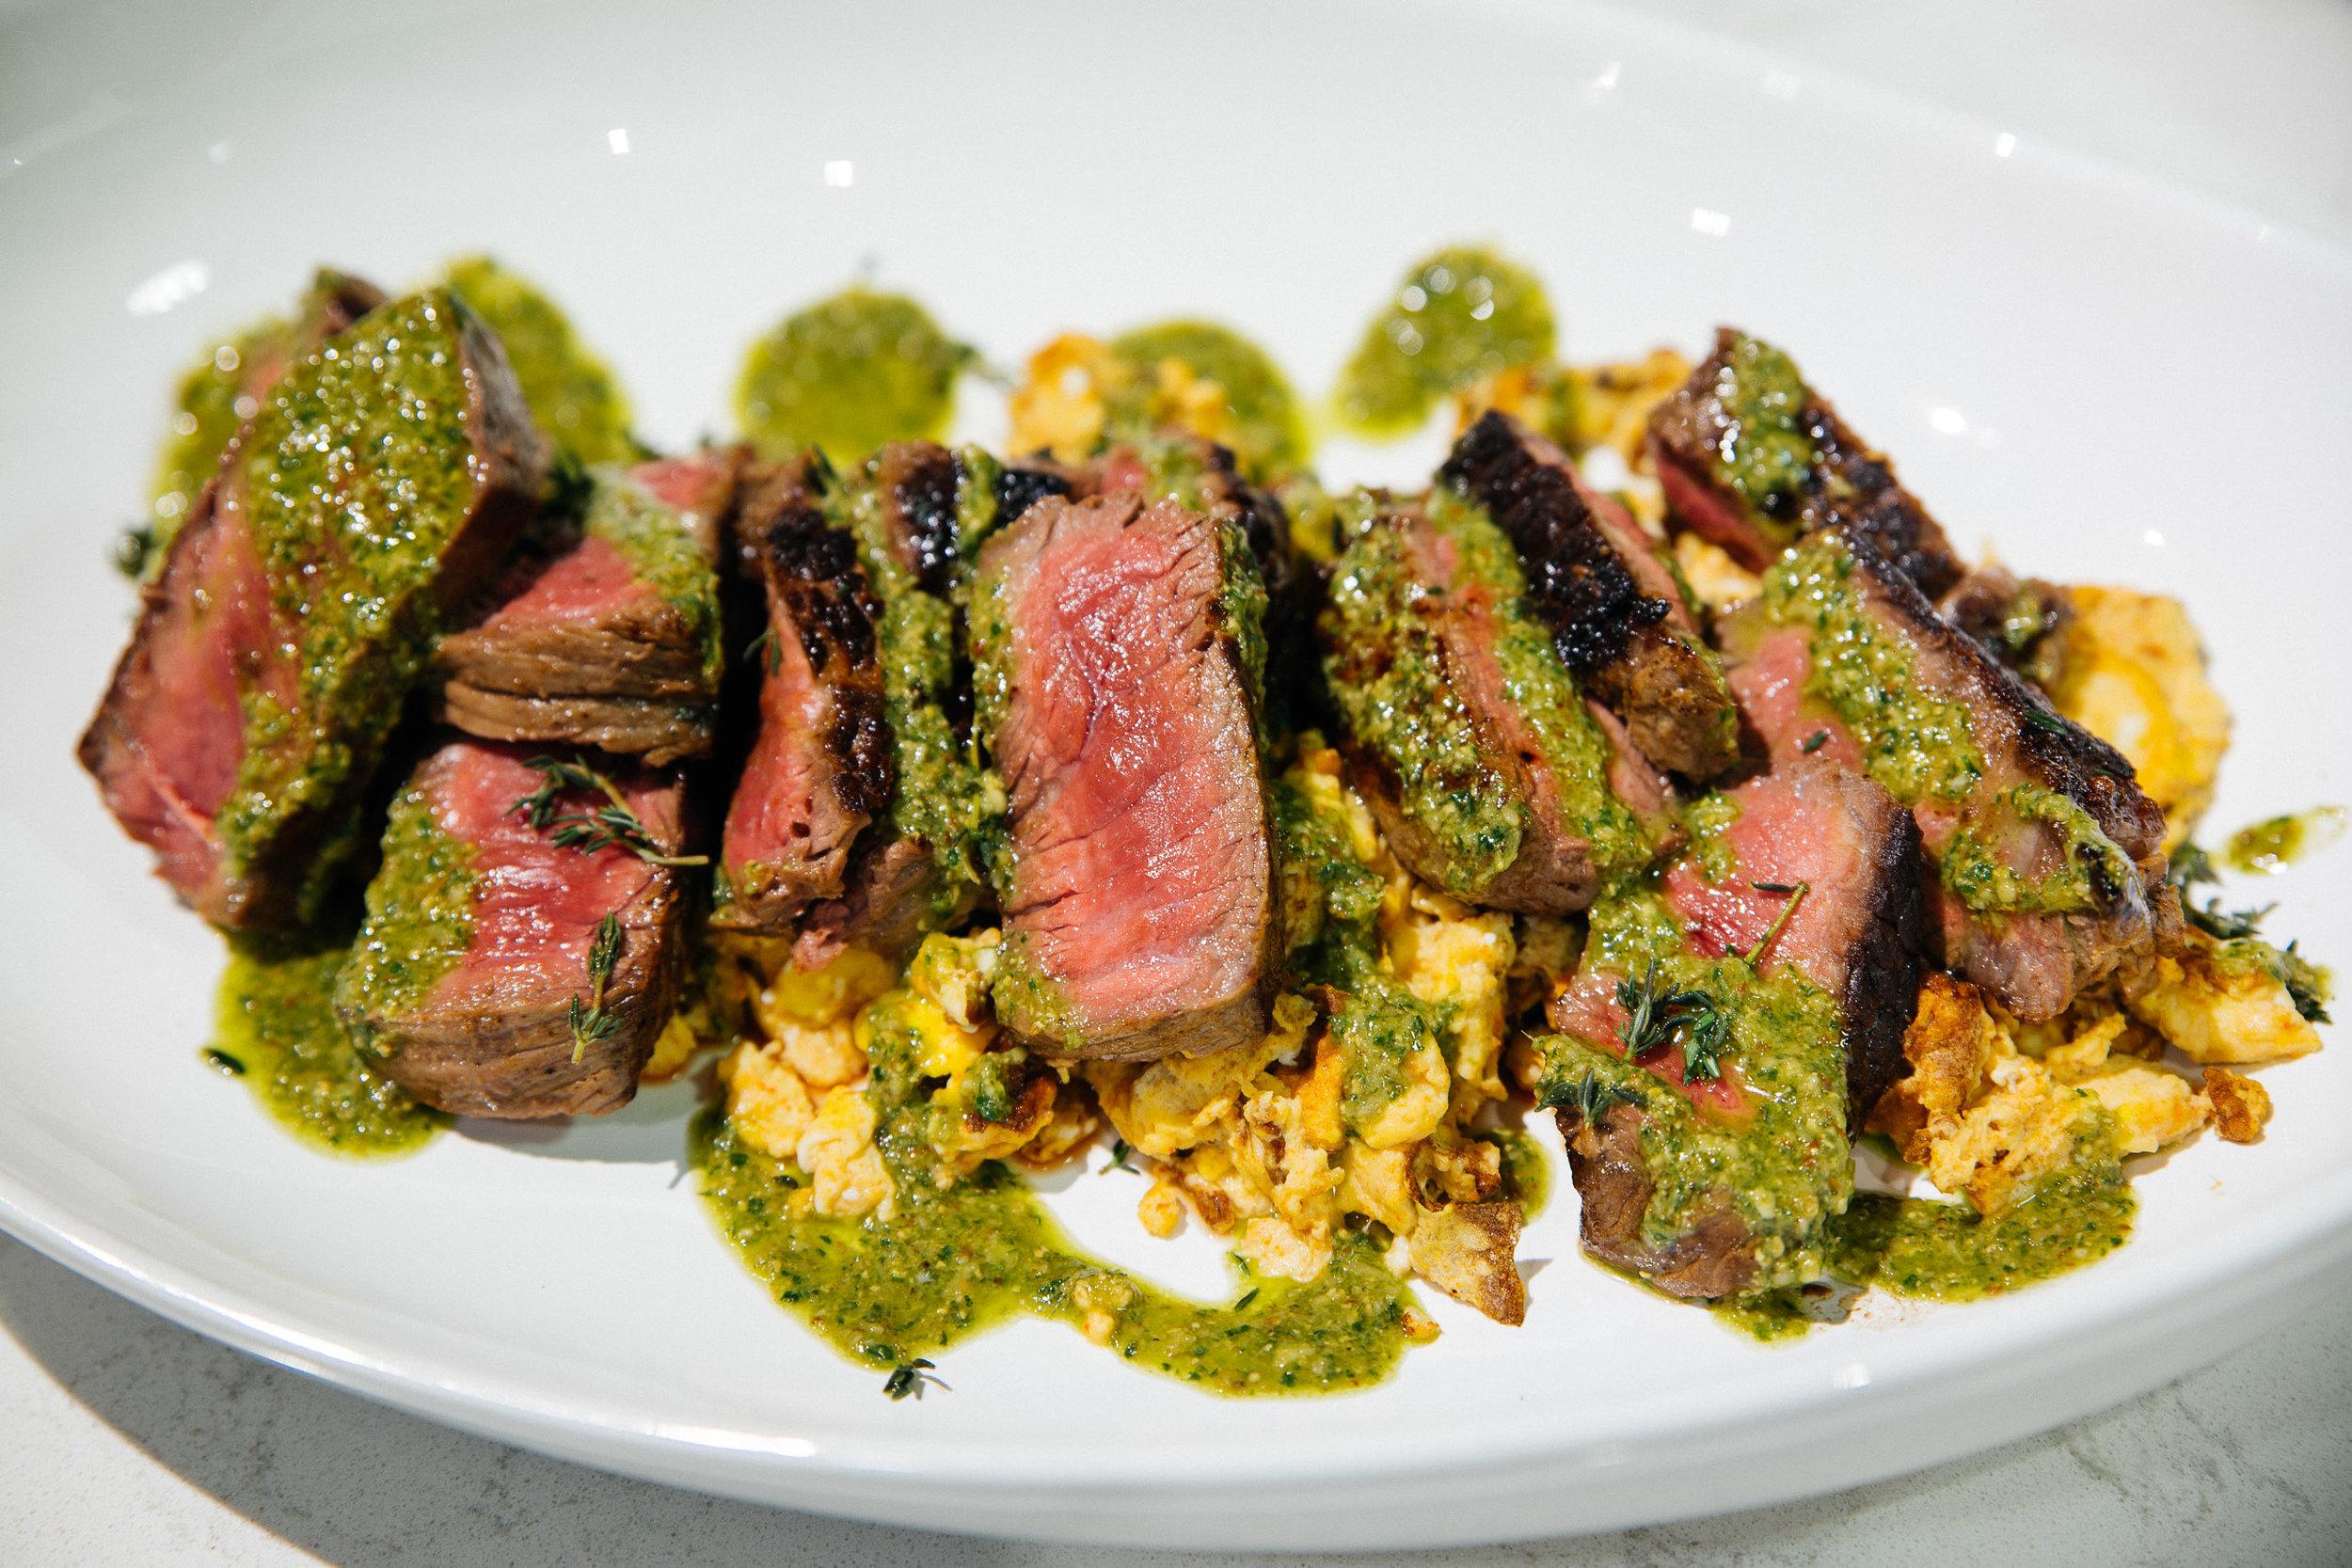 Steak & Eggs Top Sirloin + Scrambled Eggs + Canola Salsa Verde